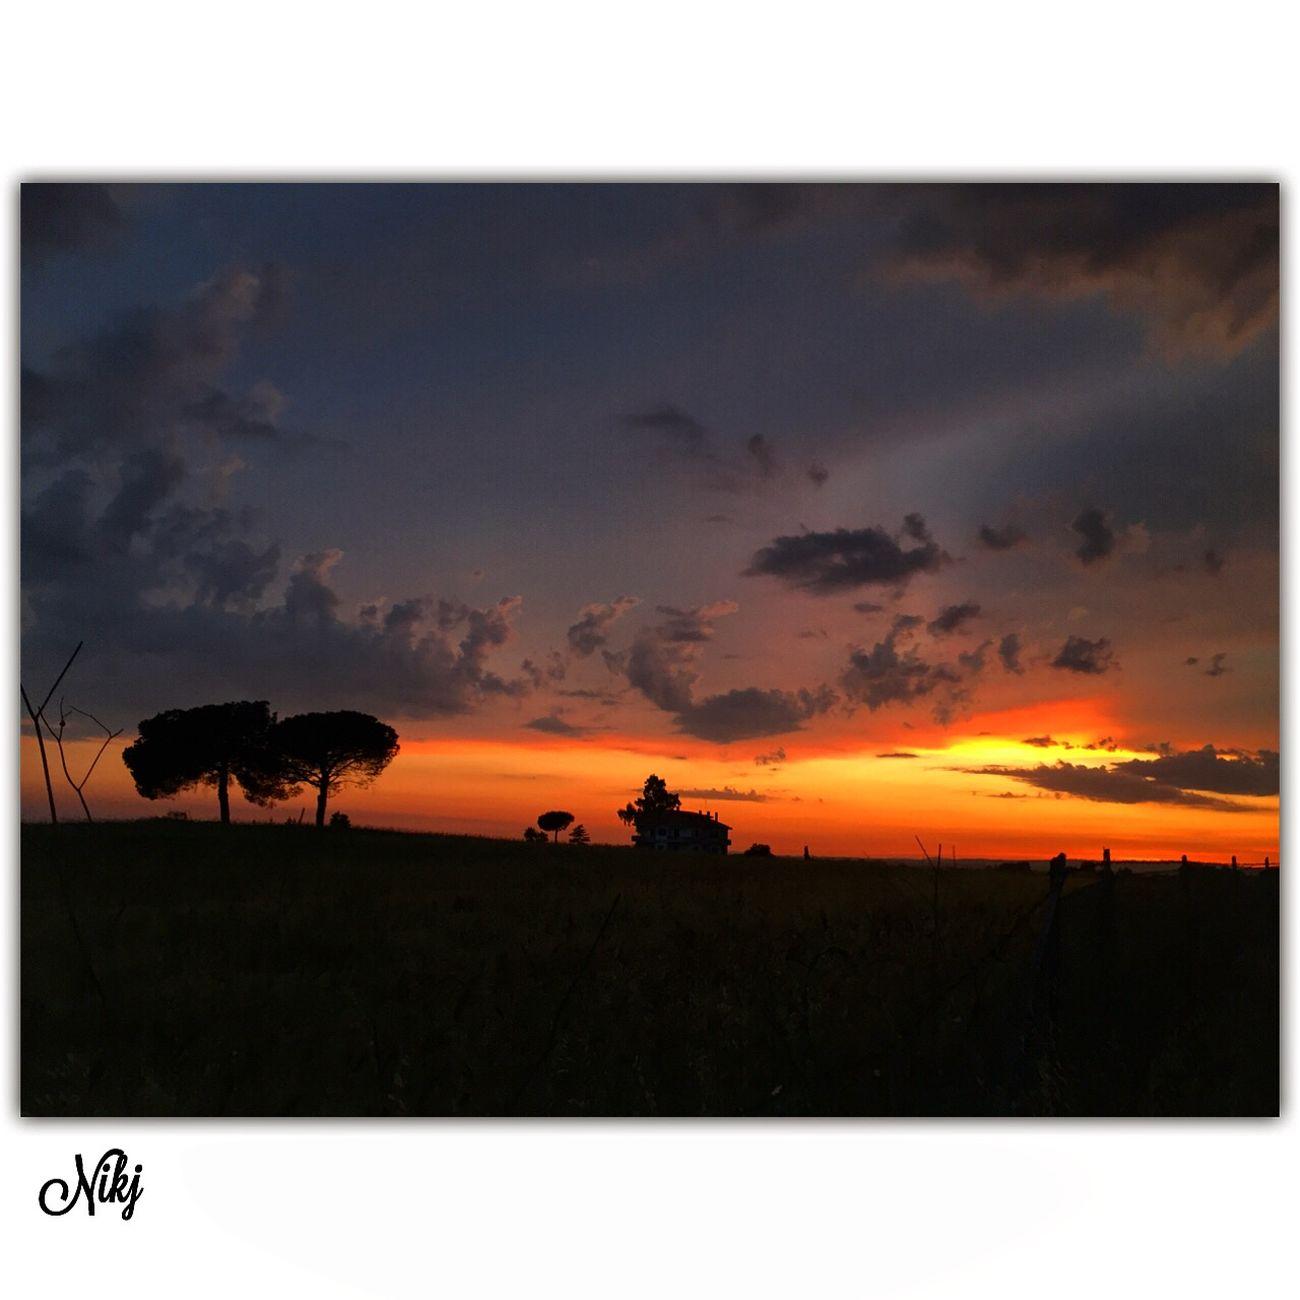 Particolaristupendi Sunset #sun #clouds #skylovers #sky #nature #beautifulinnature #naturalbeauty #photography #landscape Sunset #sun #clouds #skylovers #sky #nature #beautifulinnature #naturalbeauty Photography Landscape ? Tramonti__italiani